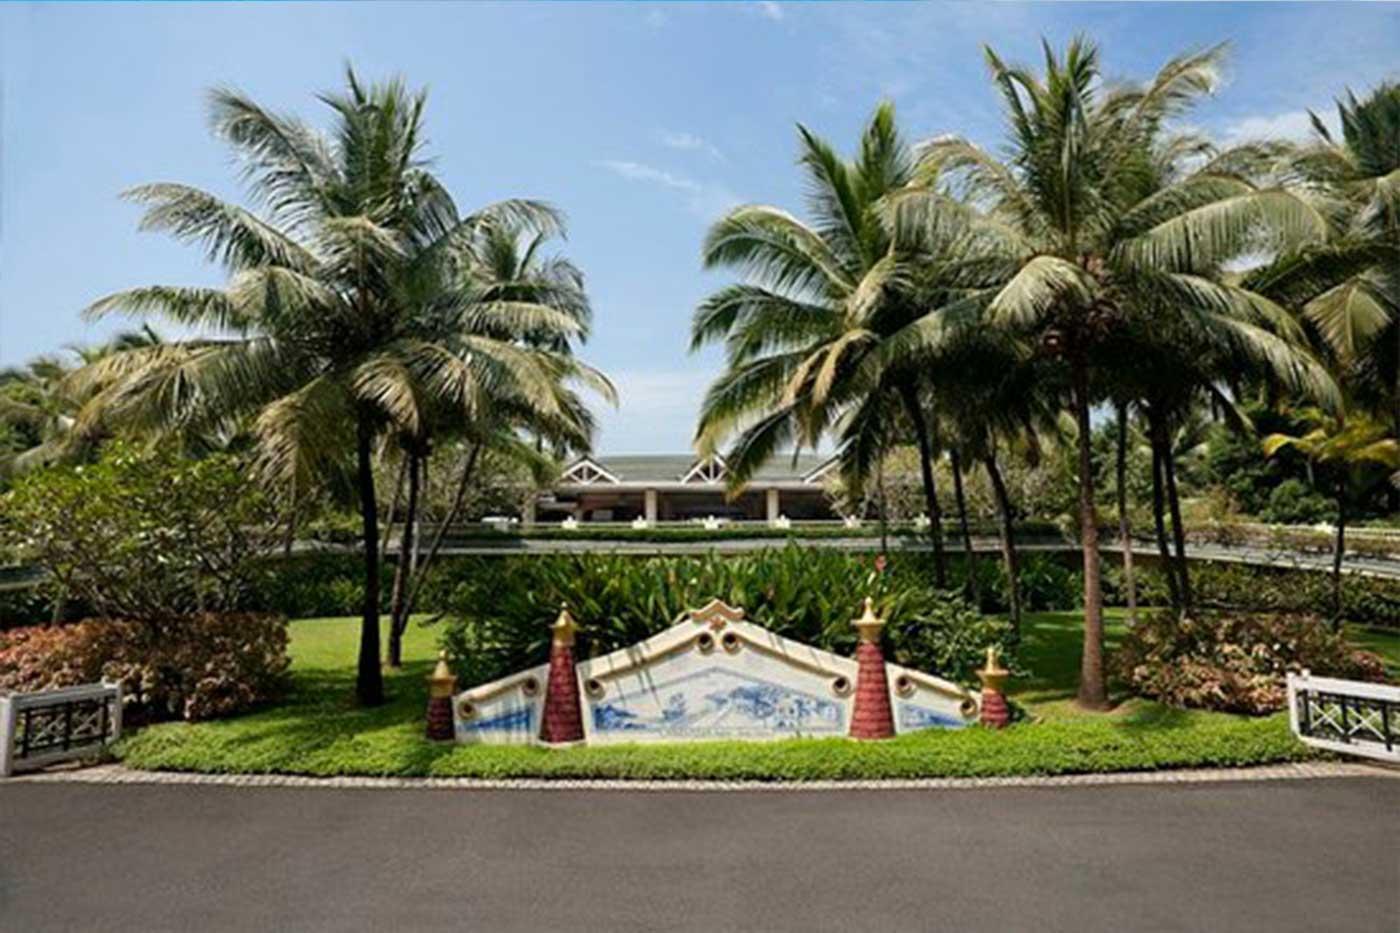 Taj Exotica Resort & Spa categorized in Top 25 luxury hotels in India